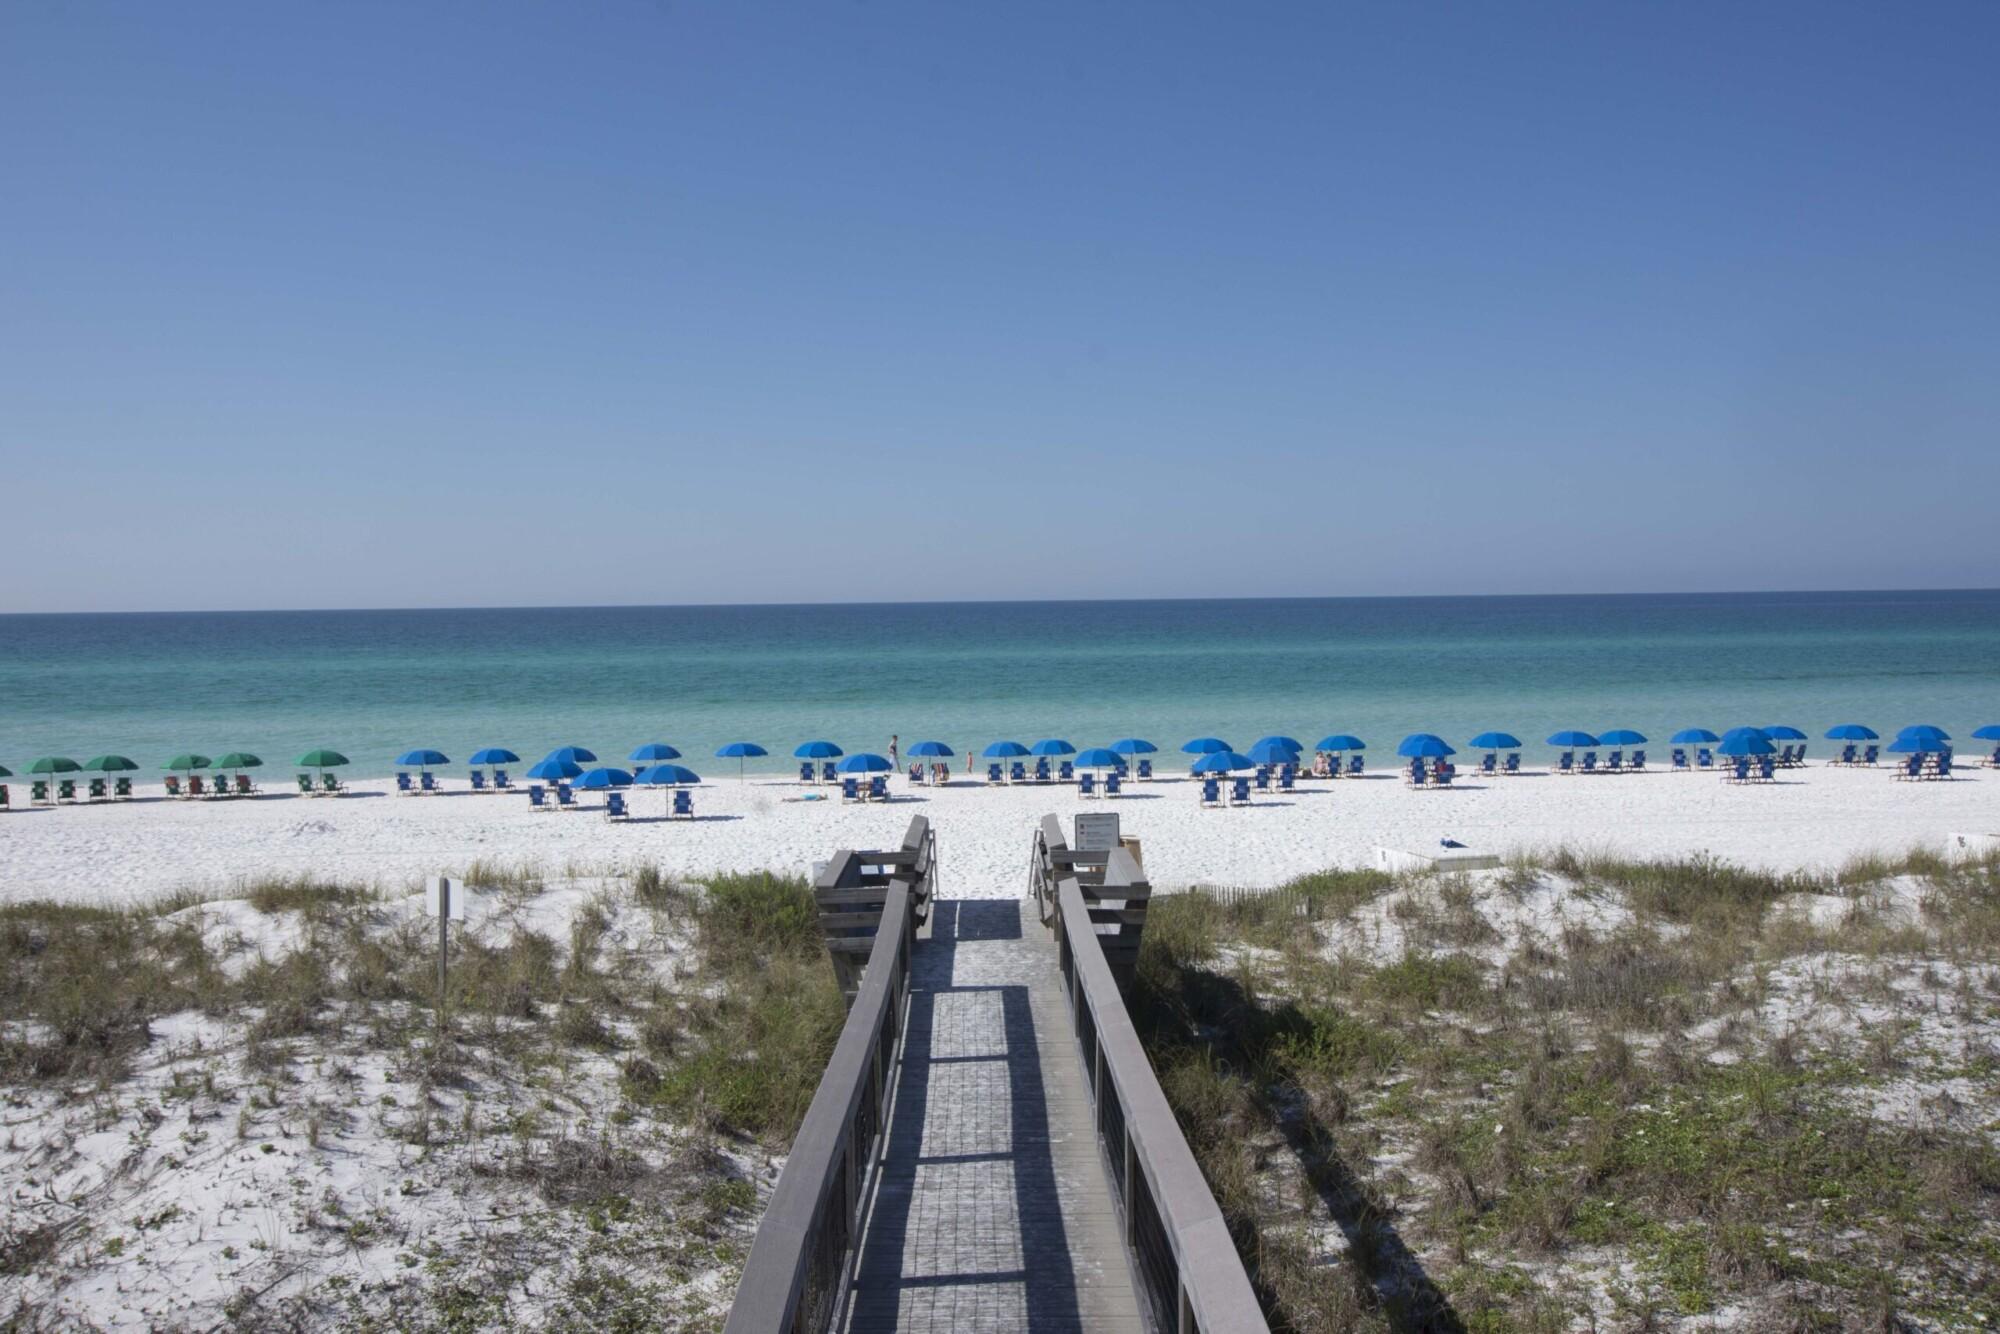 The beach boardwalk at Beach Retreat